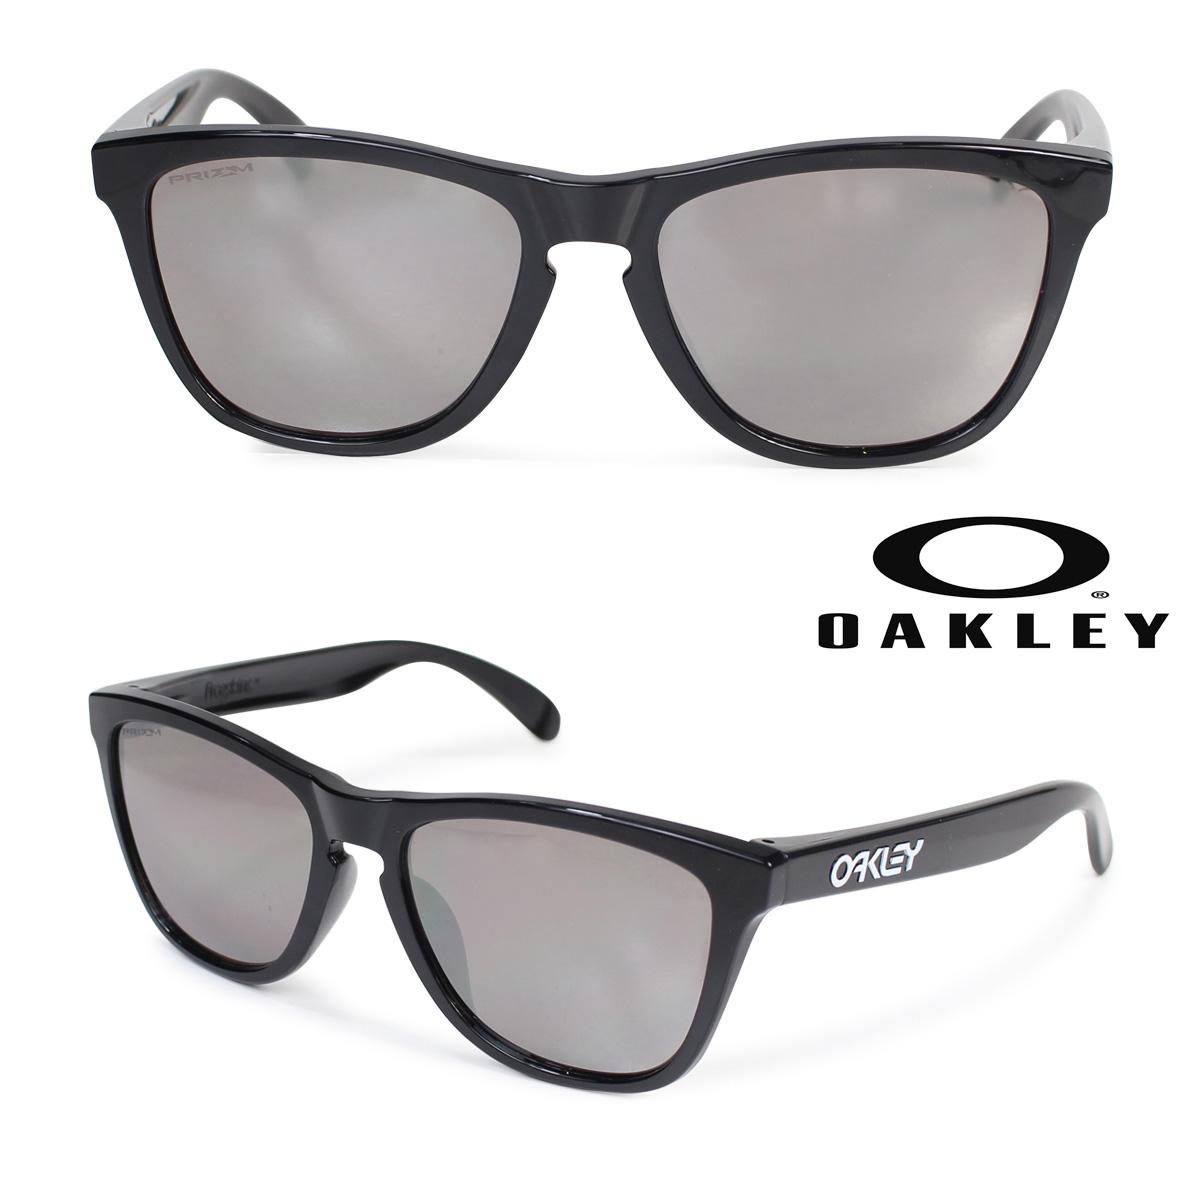 Oakley ASIA FIT サングラス アジアンフィット オークリー Frogskins フロッグスキン OO9245-62 メンズ レディース